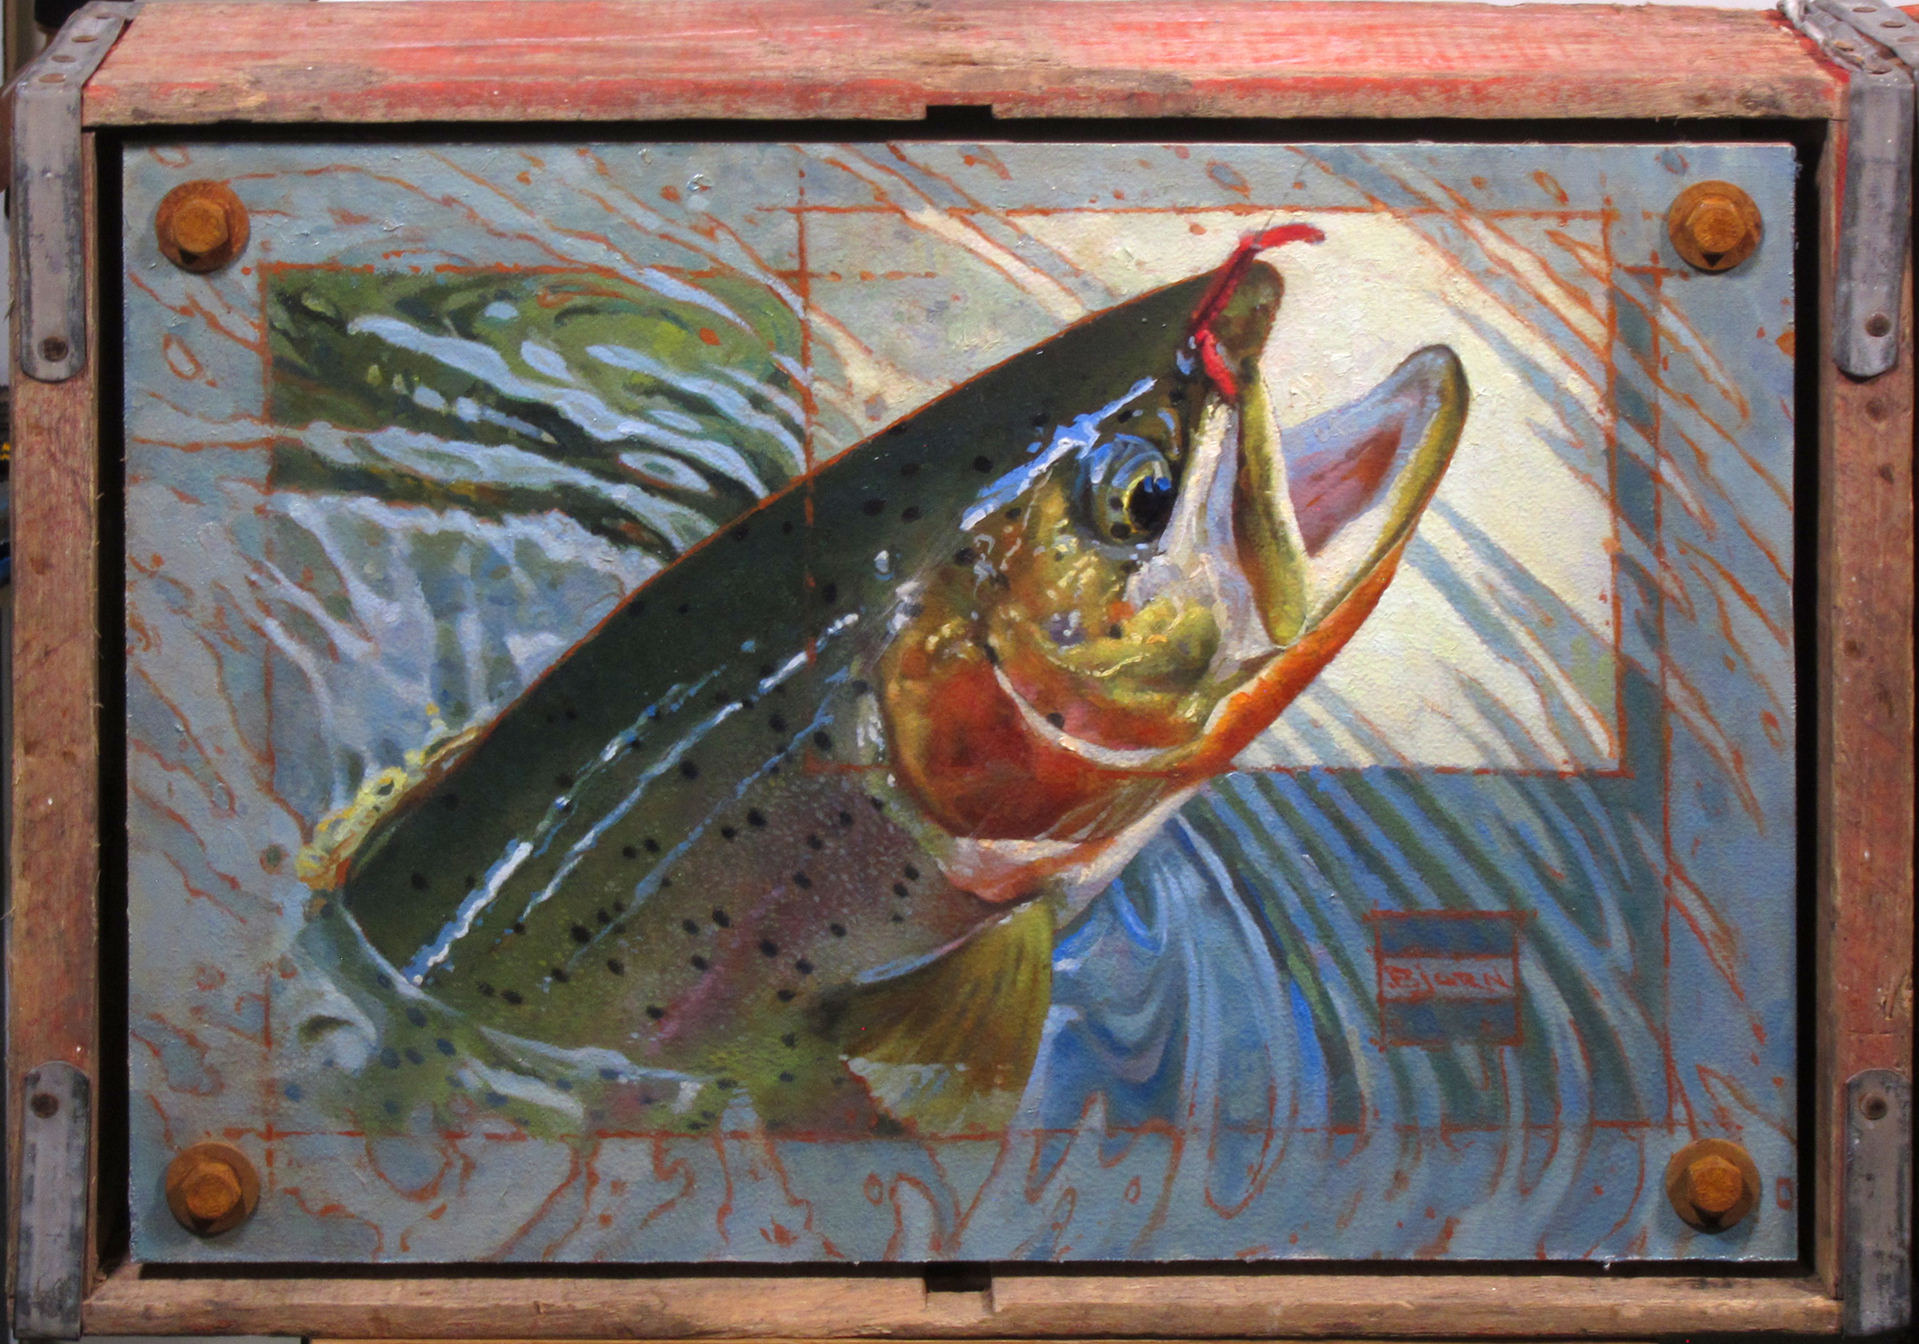 San Juan Trout by Bjorn Thorkelson